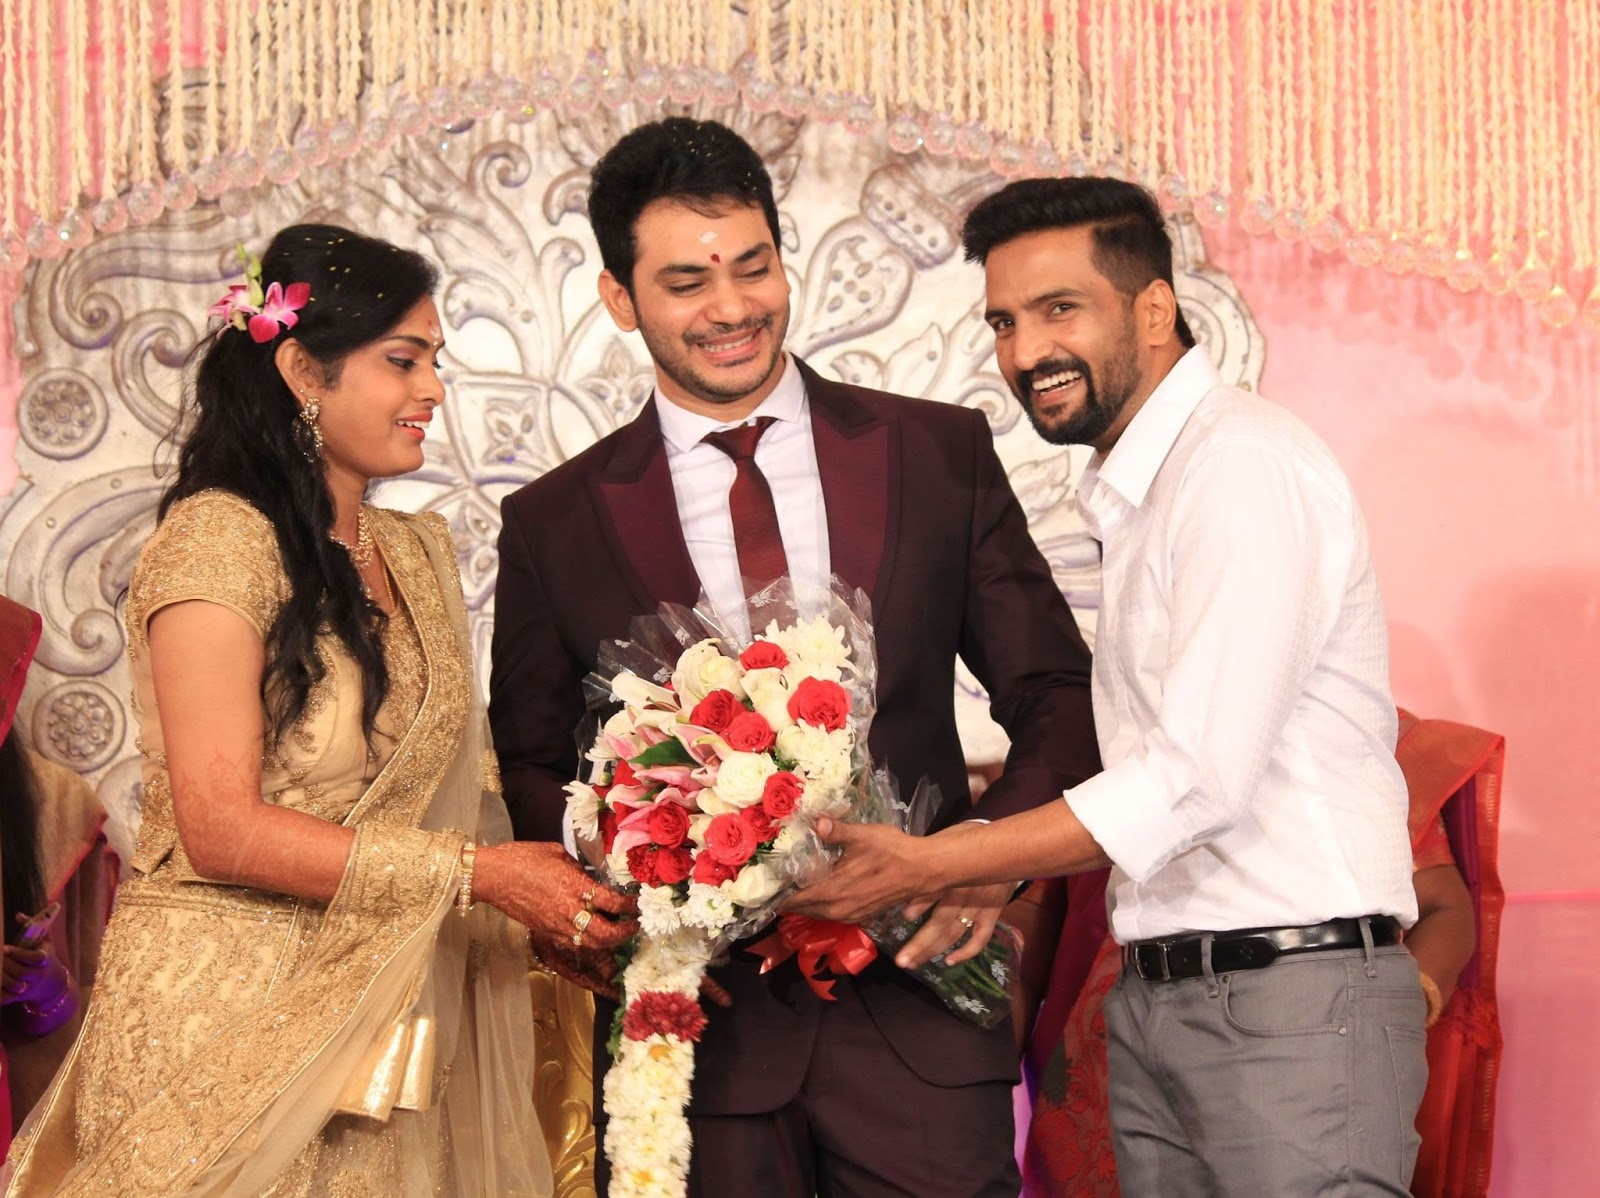 Doctor Turned Actor Sethu And Umayal Wedding Reception Indian